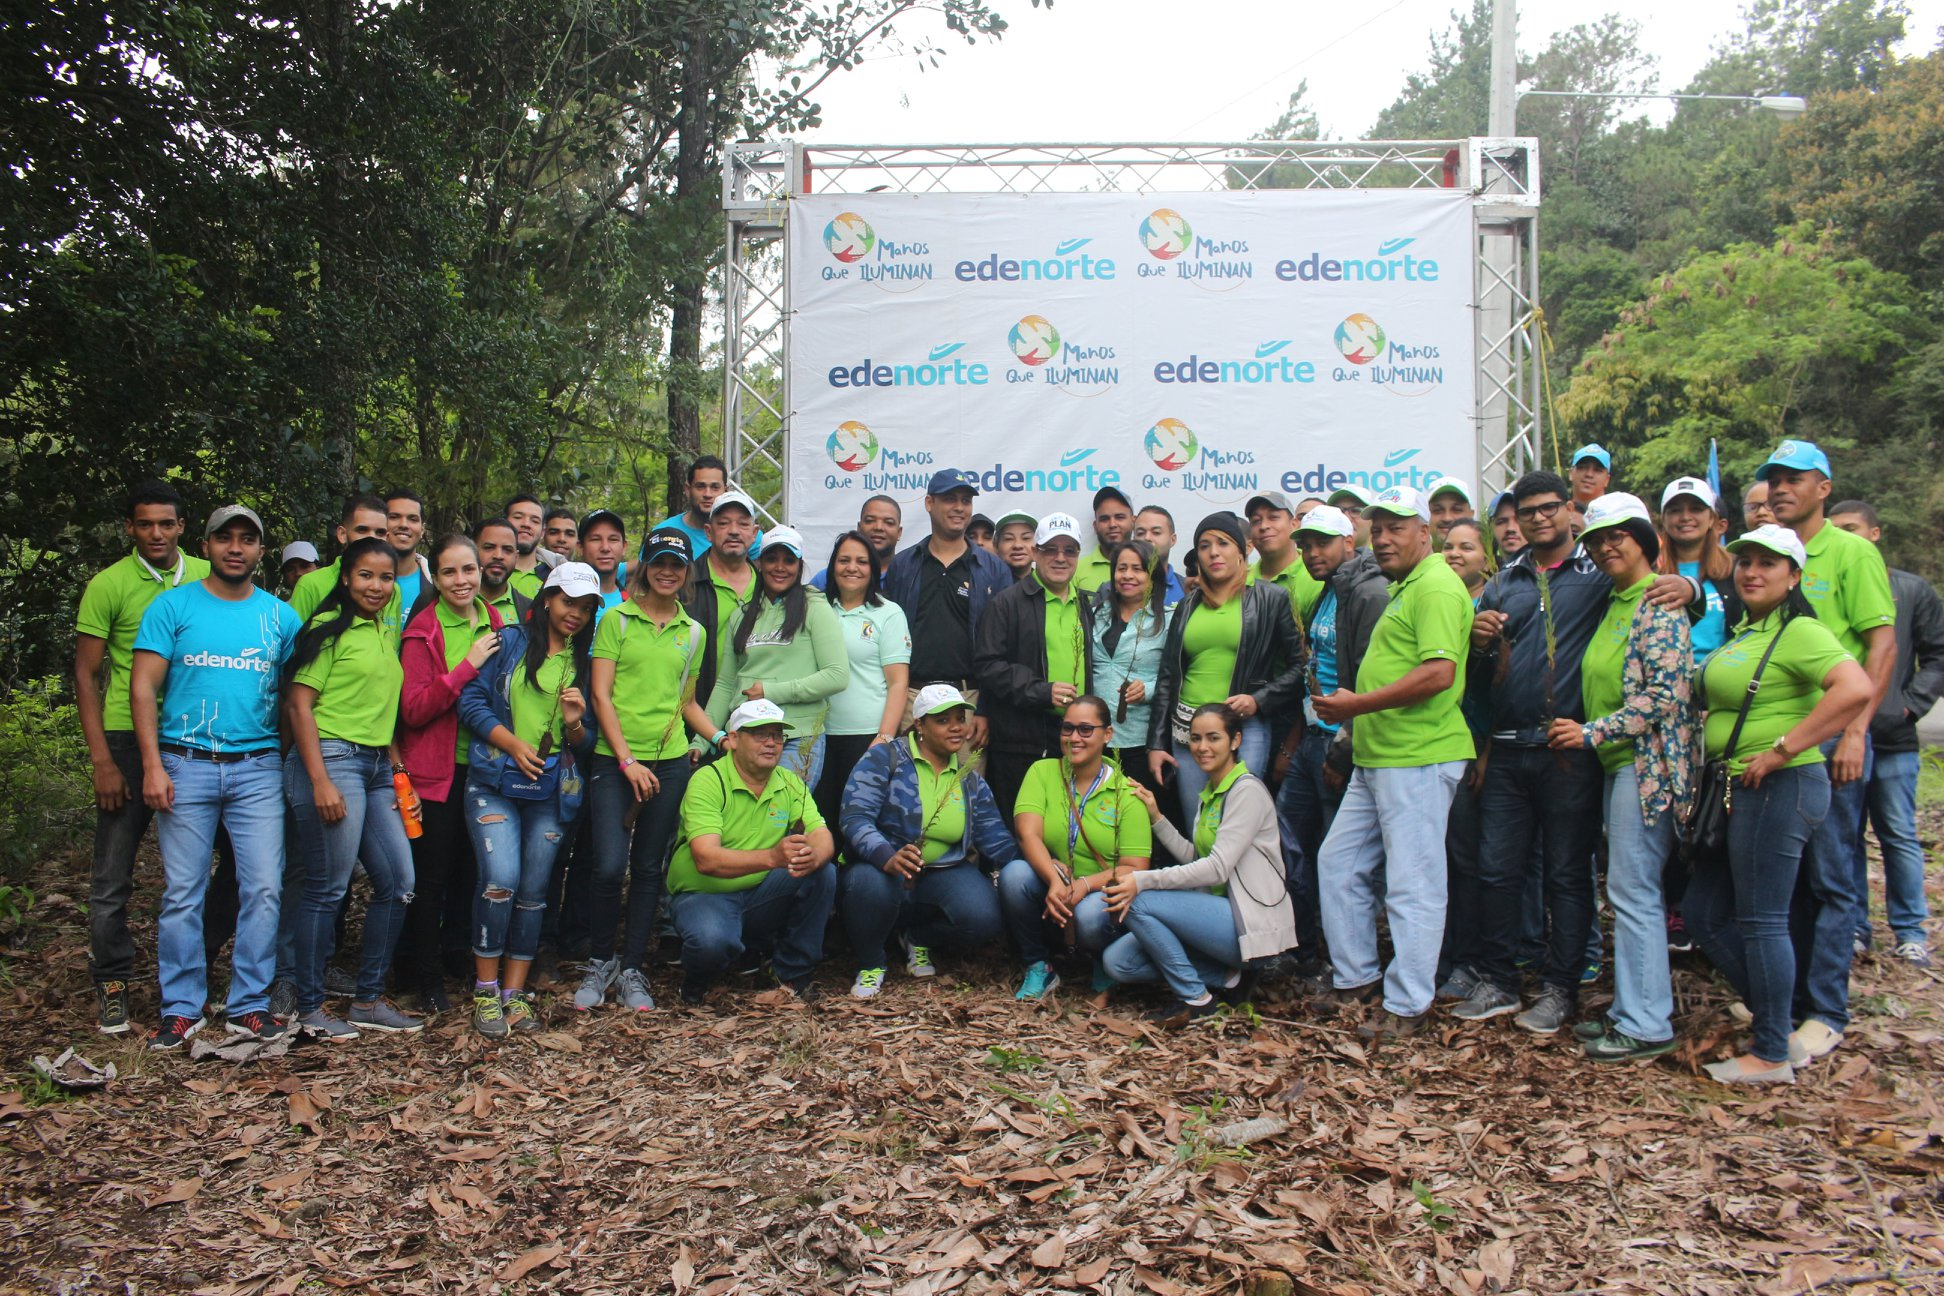 EDENORTE reforesta zona donde produjo poda para instalar servicio eléctrico